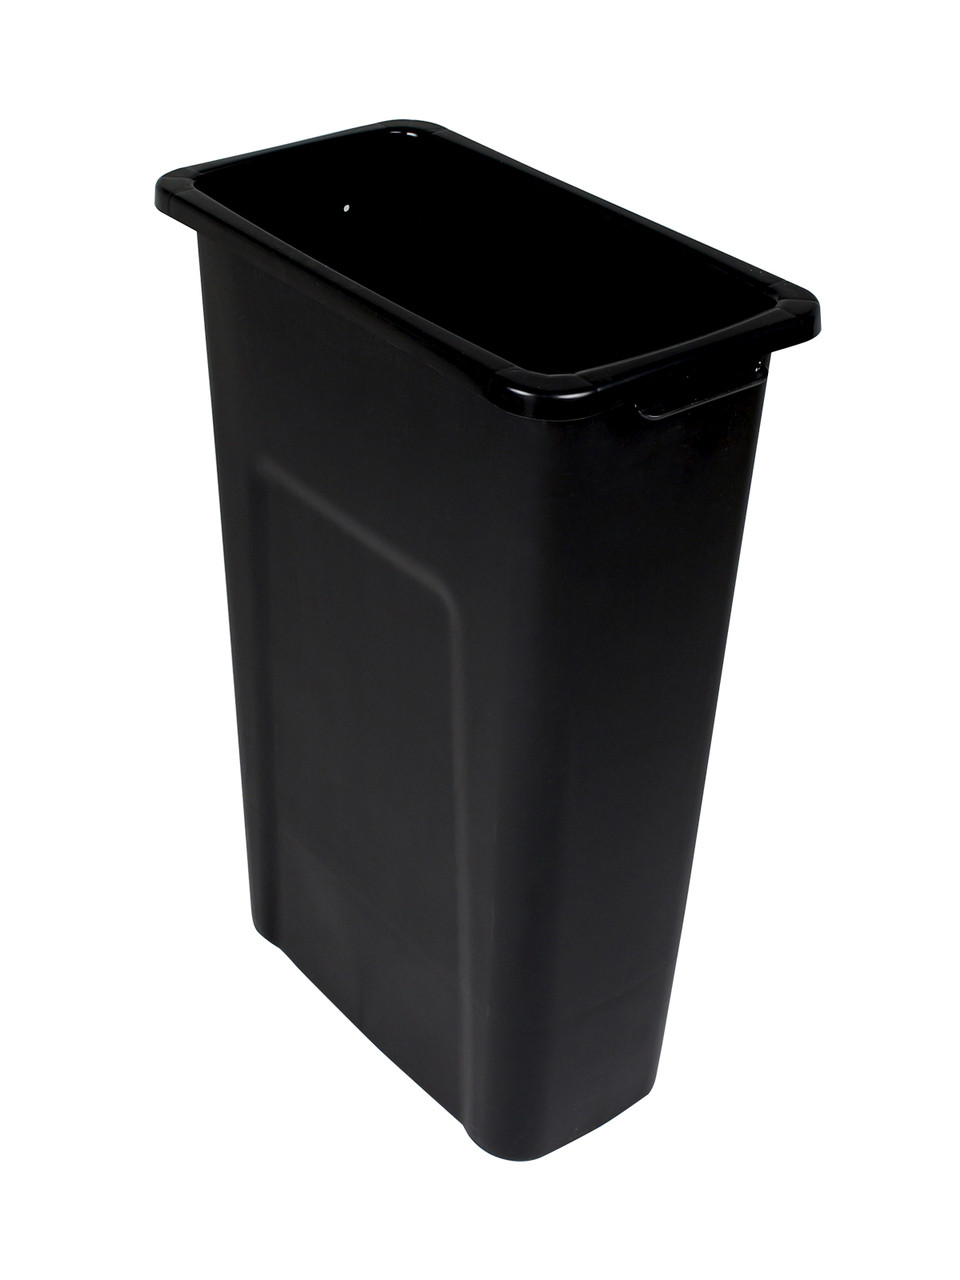 23 Gallon Skinny Plastic Home & Office Trash Can Black